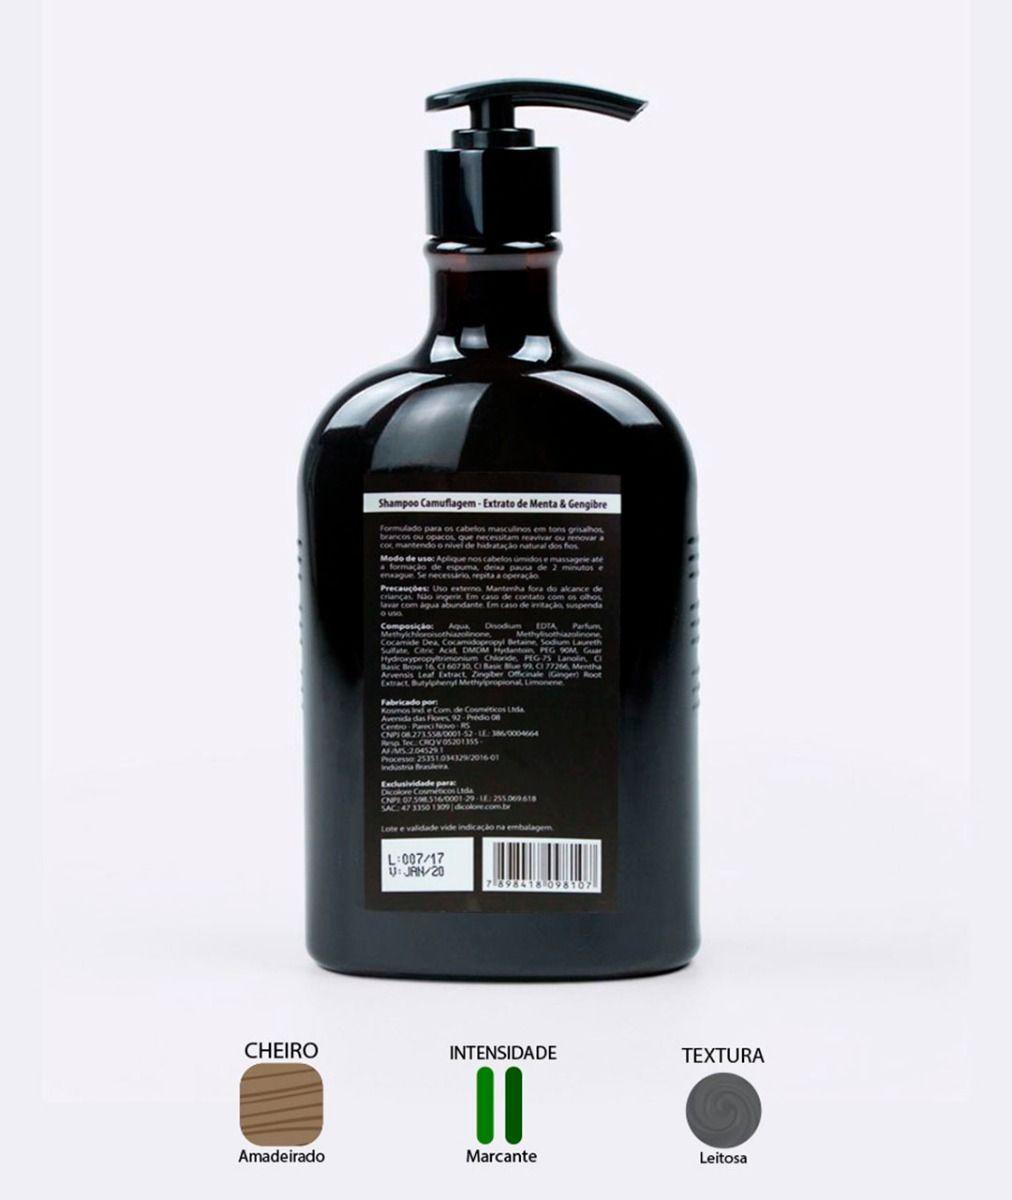 Shampoo Camuflagem Barbershop Dicolore 500ml